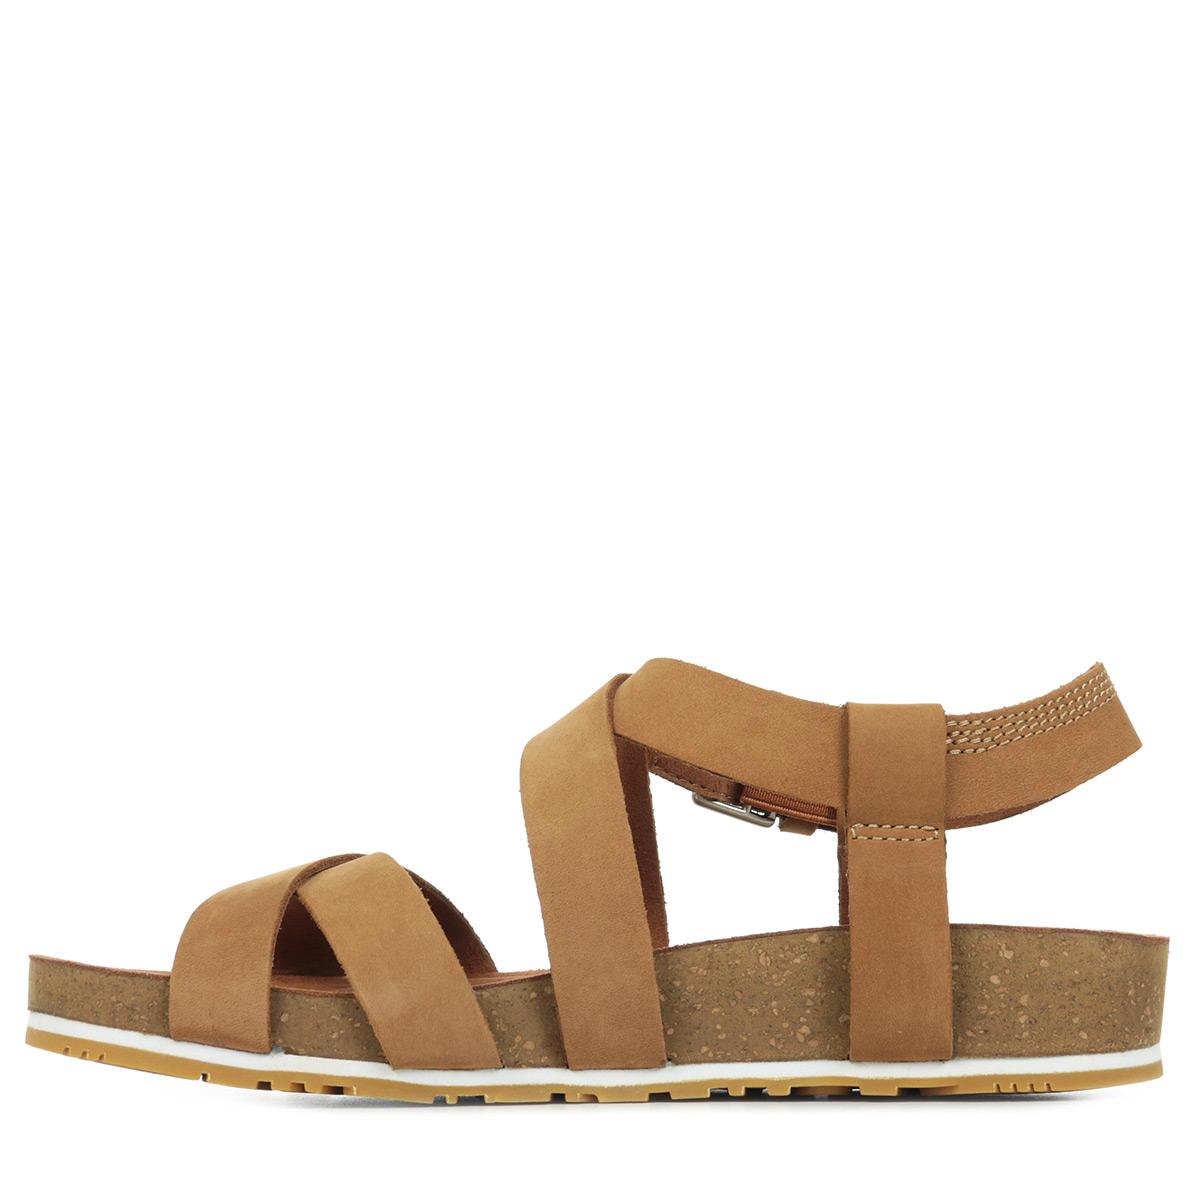 Ca1mqrSandales Femme Malibu Ankle Sandal Timberland Strap Waves ywPvmnON08